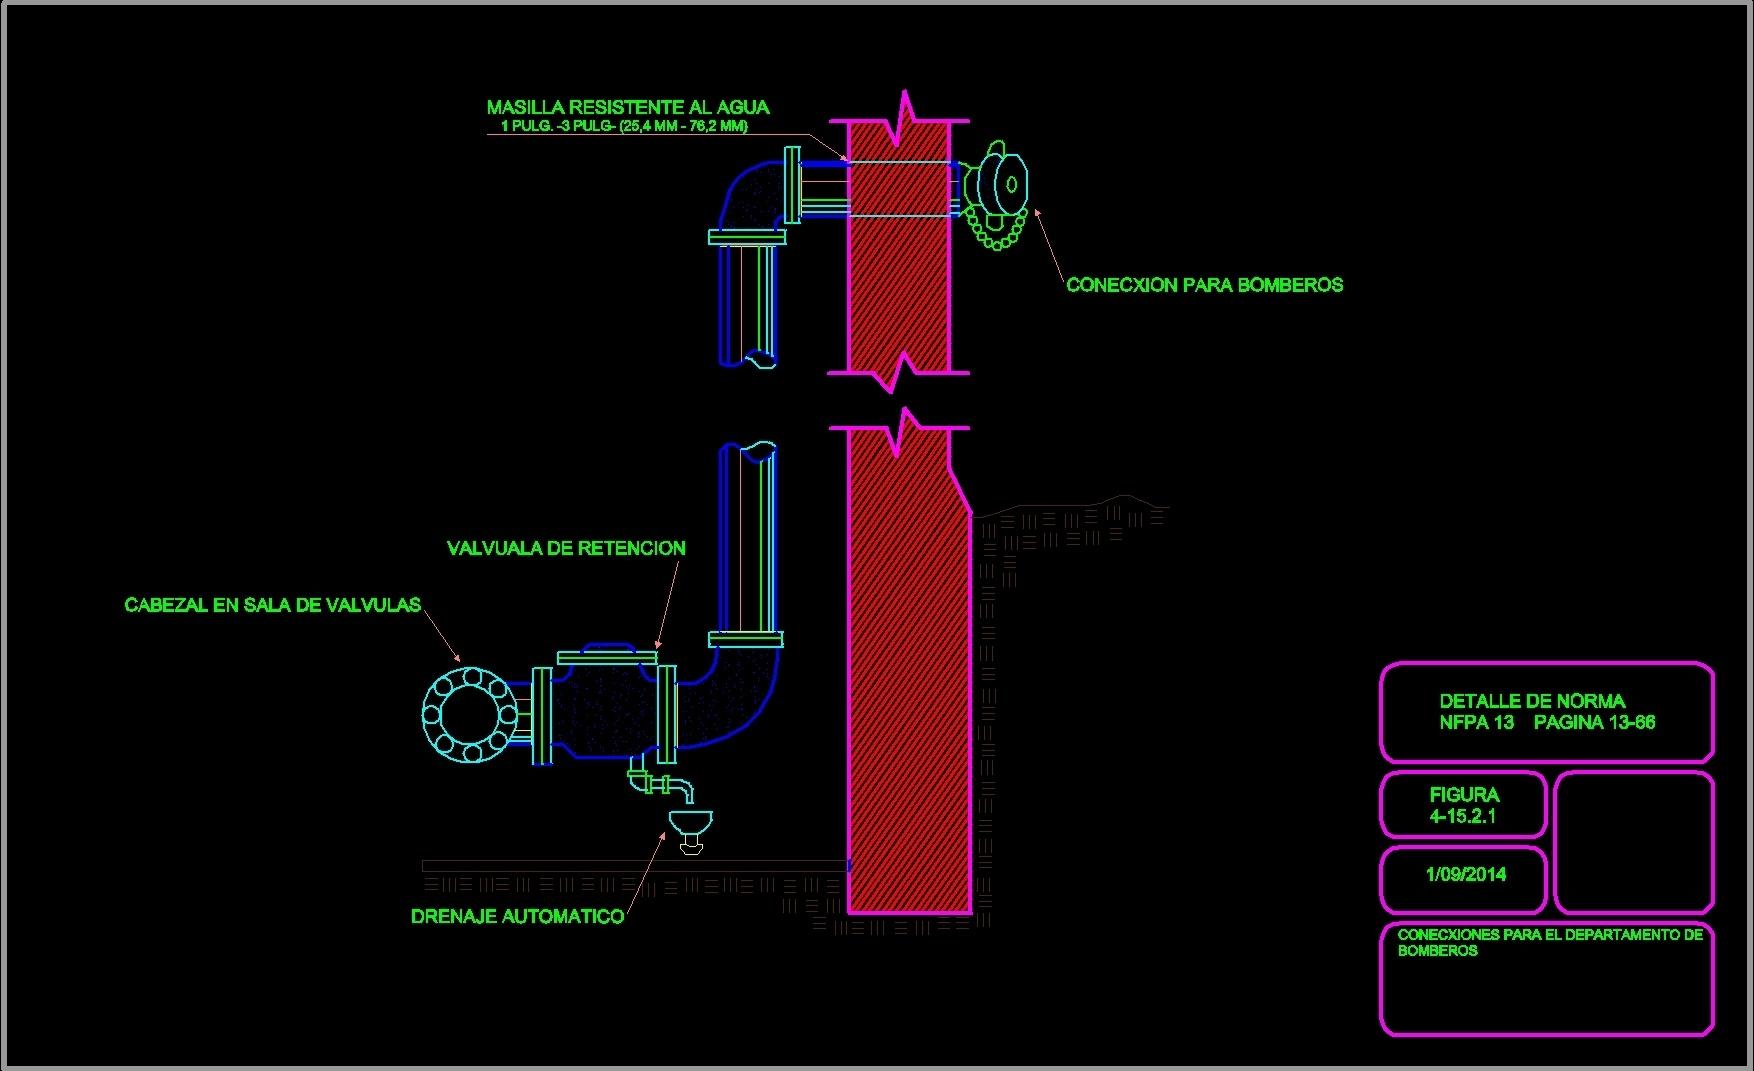 water fire sprinklers dwg block for autocad  u2022 designs cad